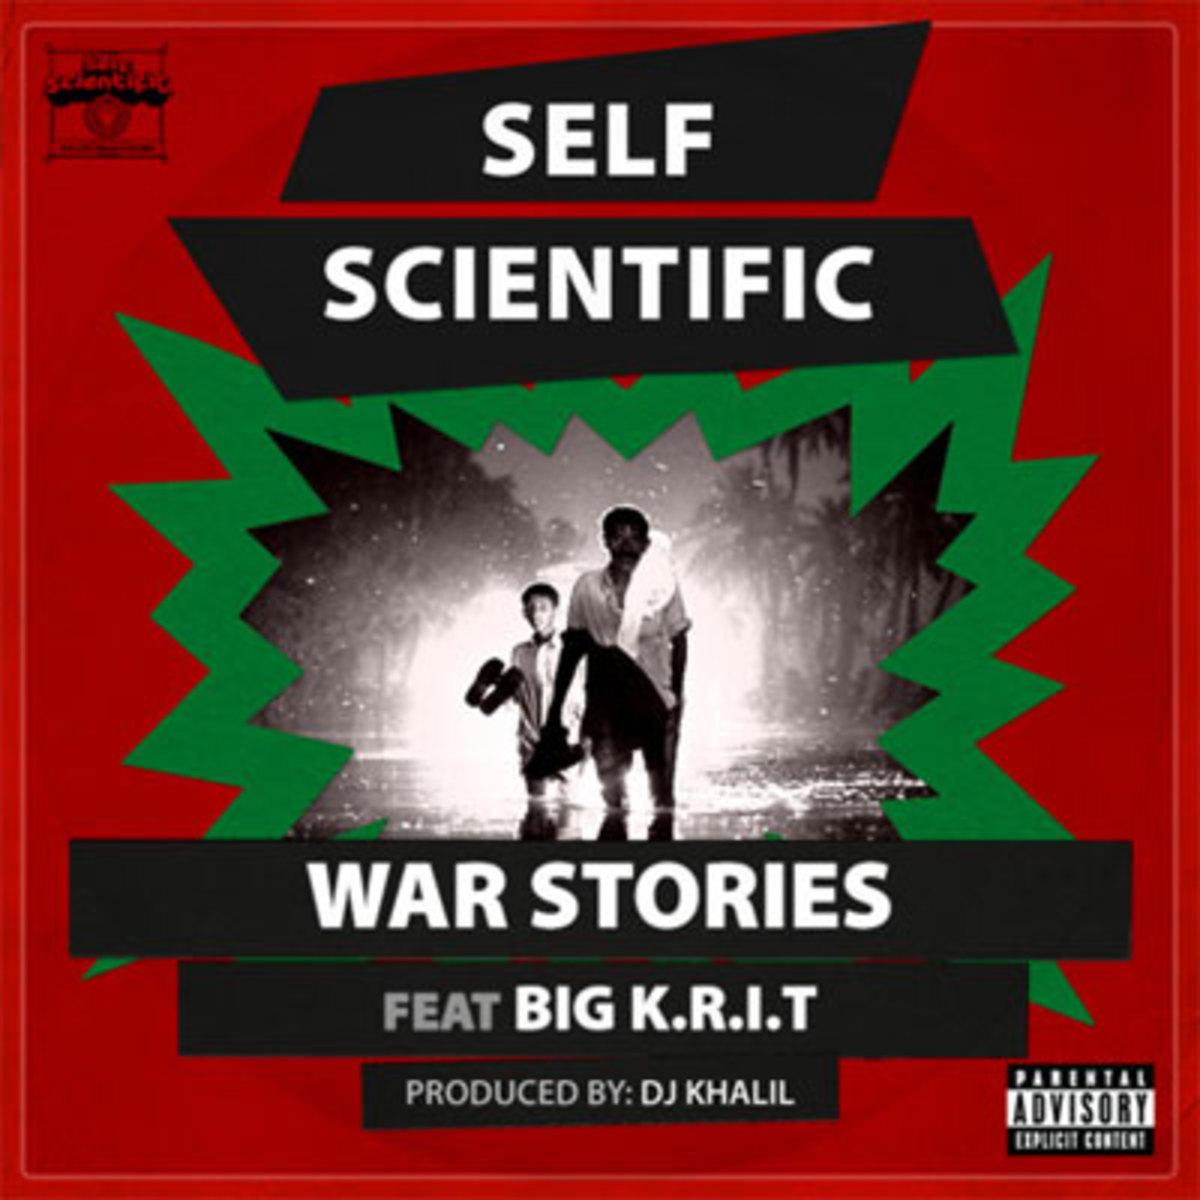 selfscientific-warstories.jpg